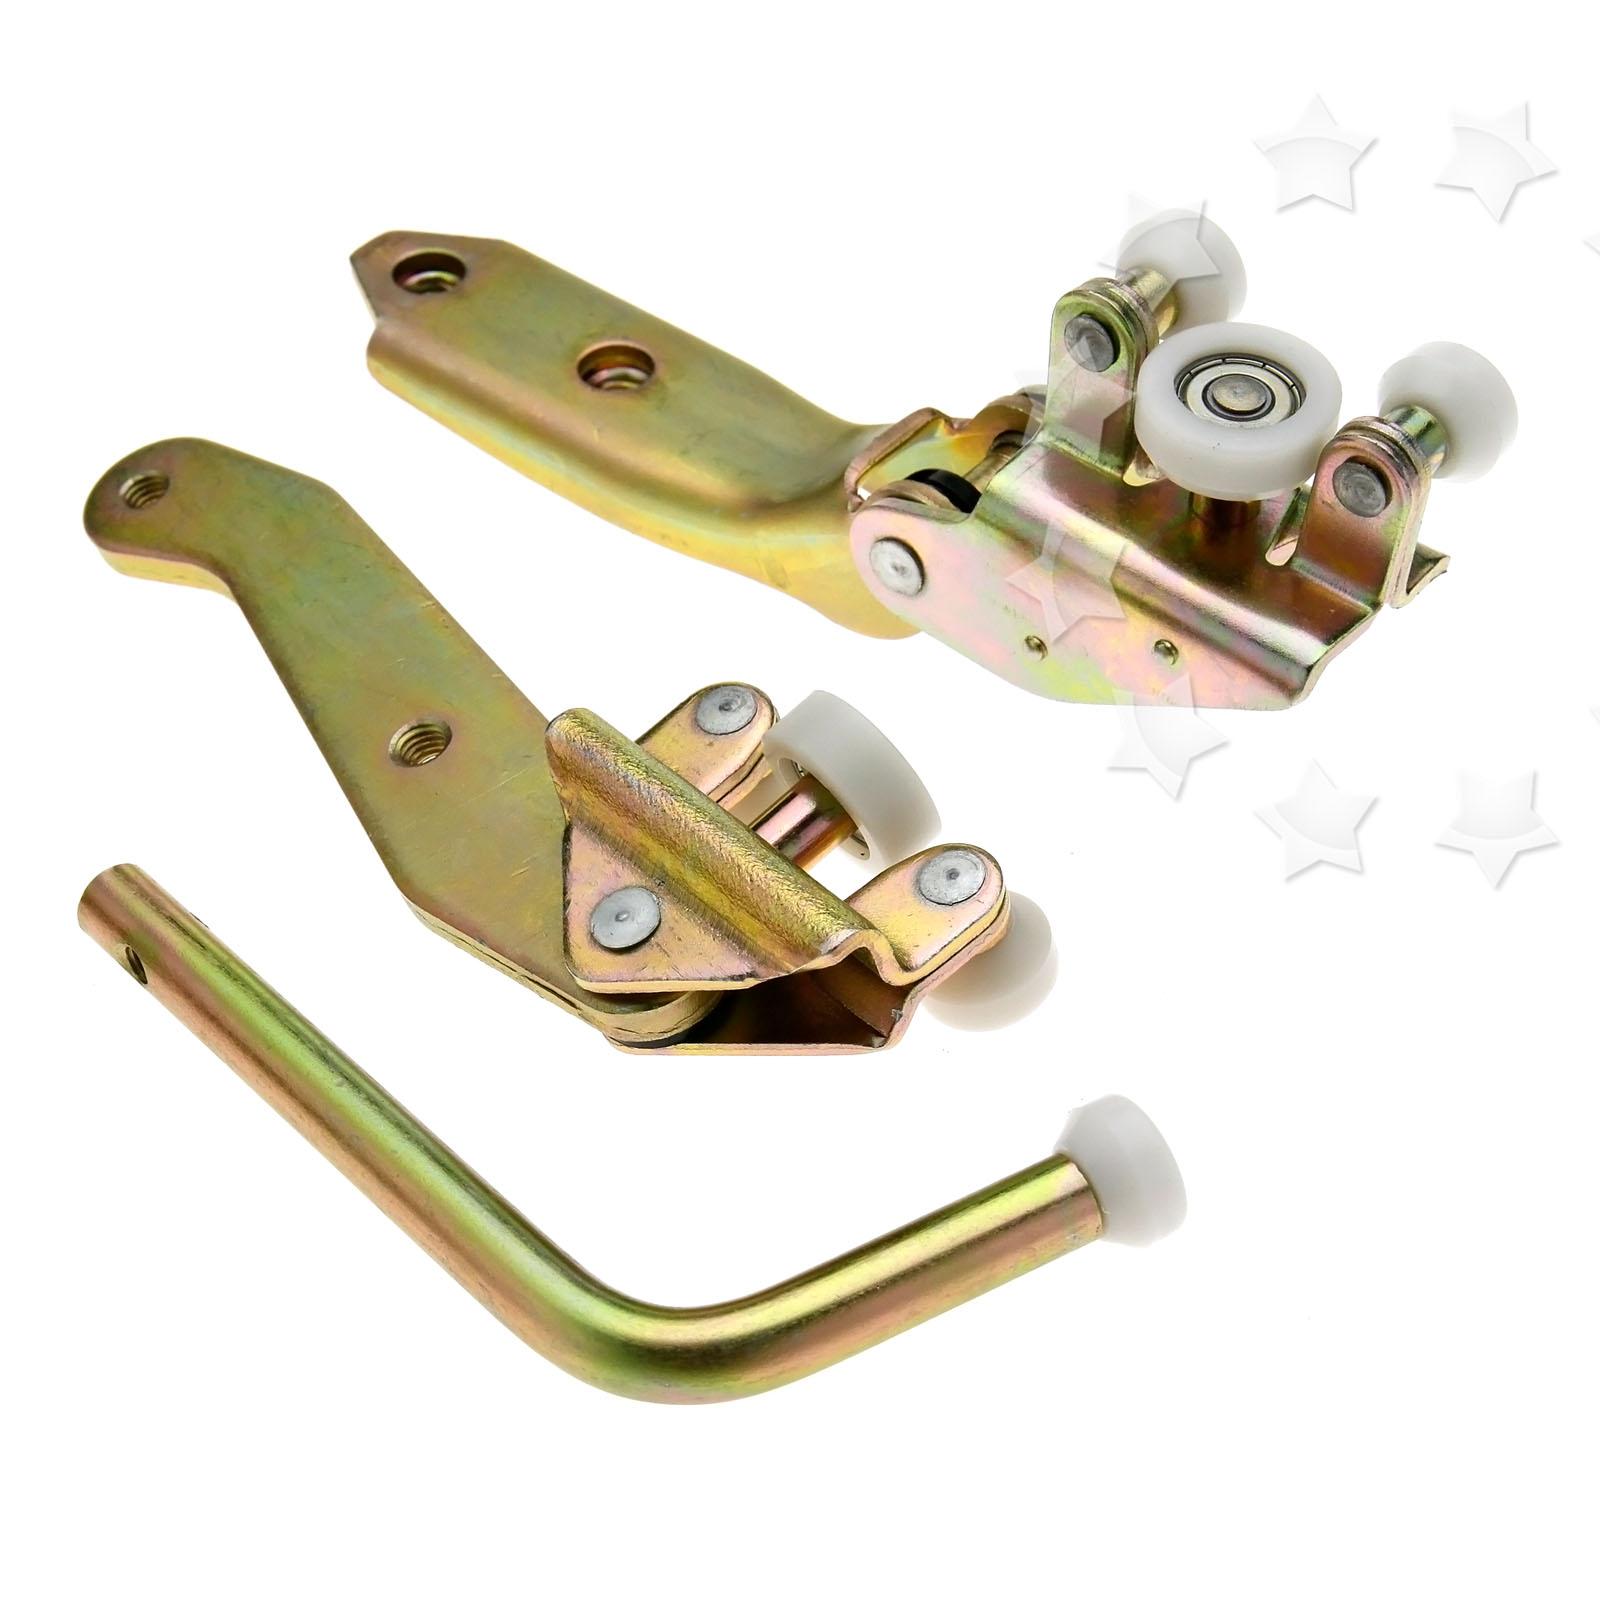 5x Oil Sump Series Socket Kit Drain Plug Key Hex Square